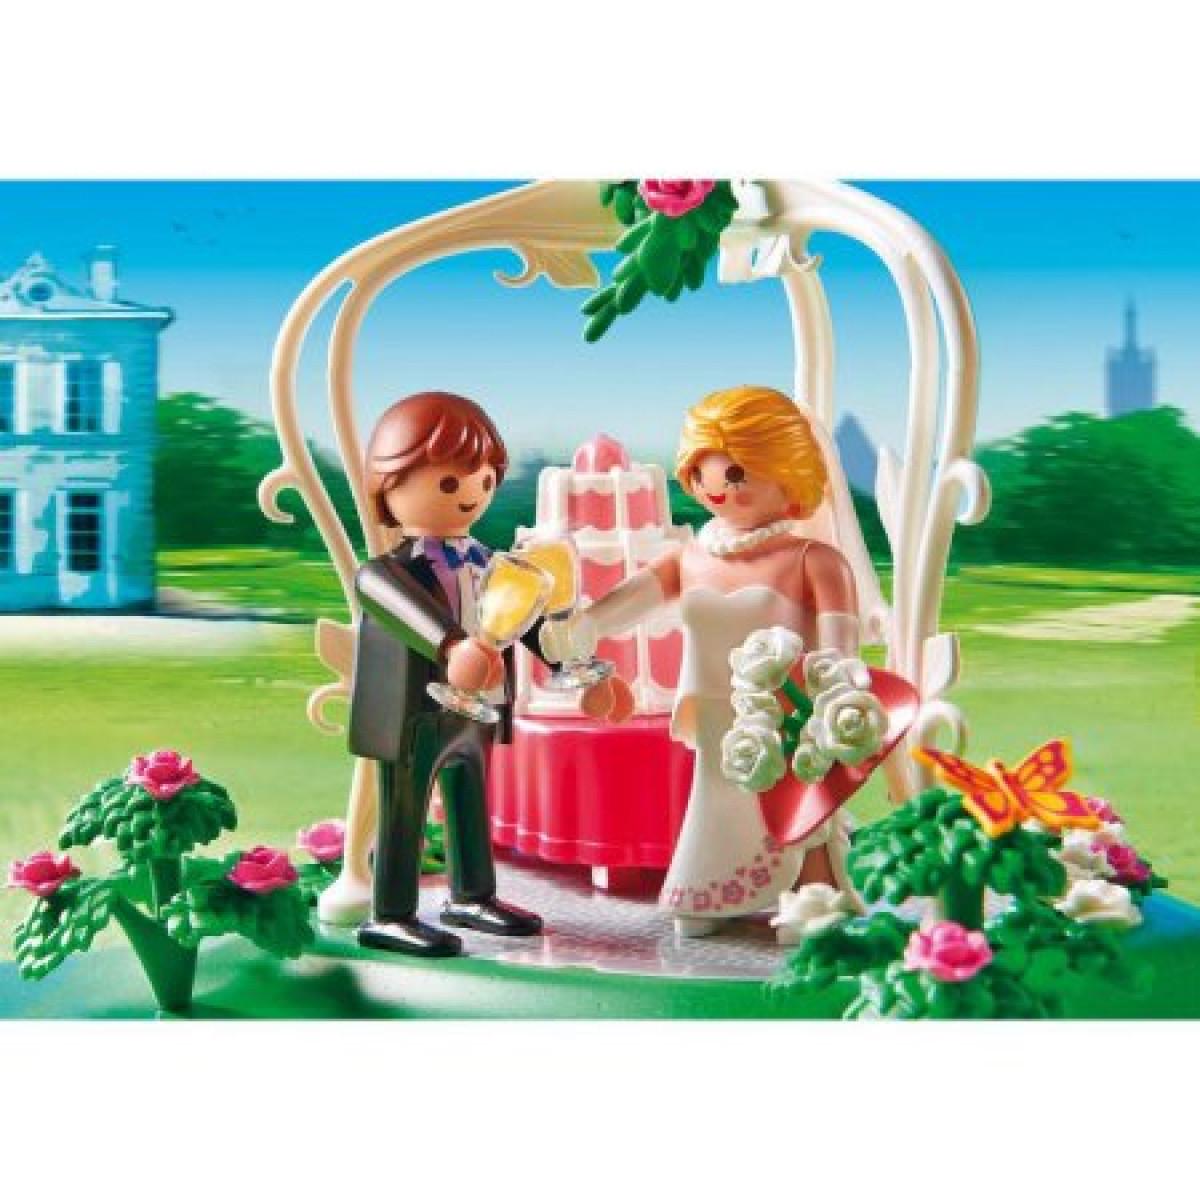 playmobil wedding celebration